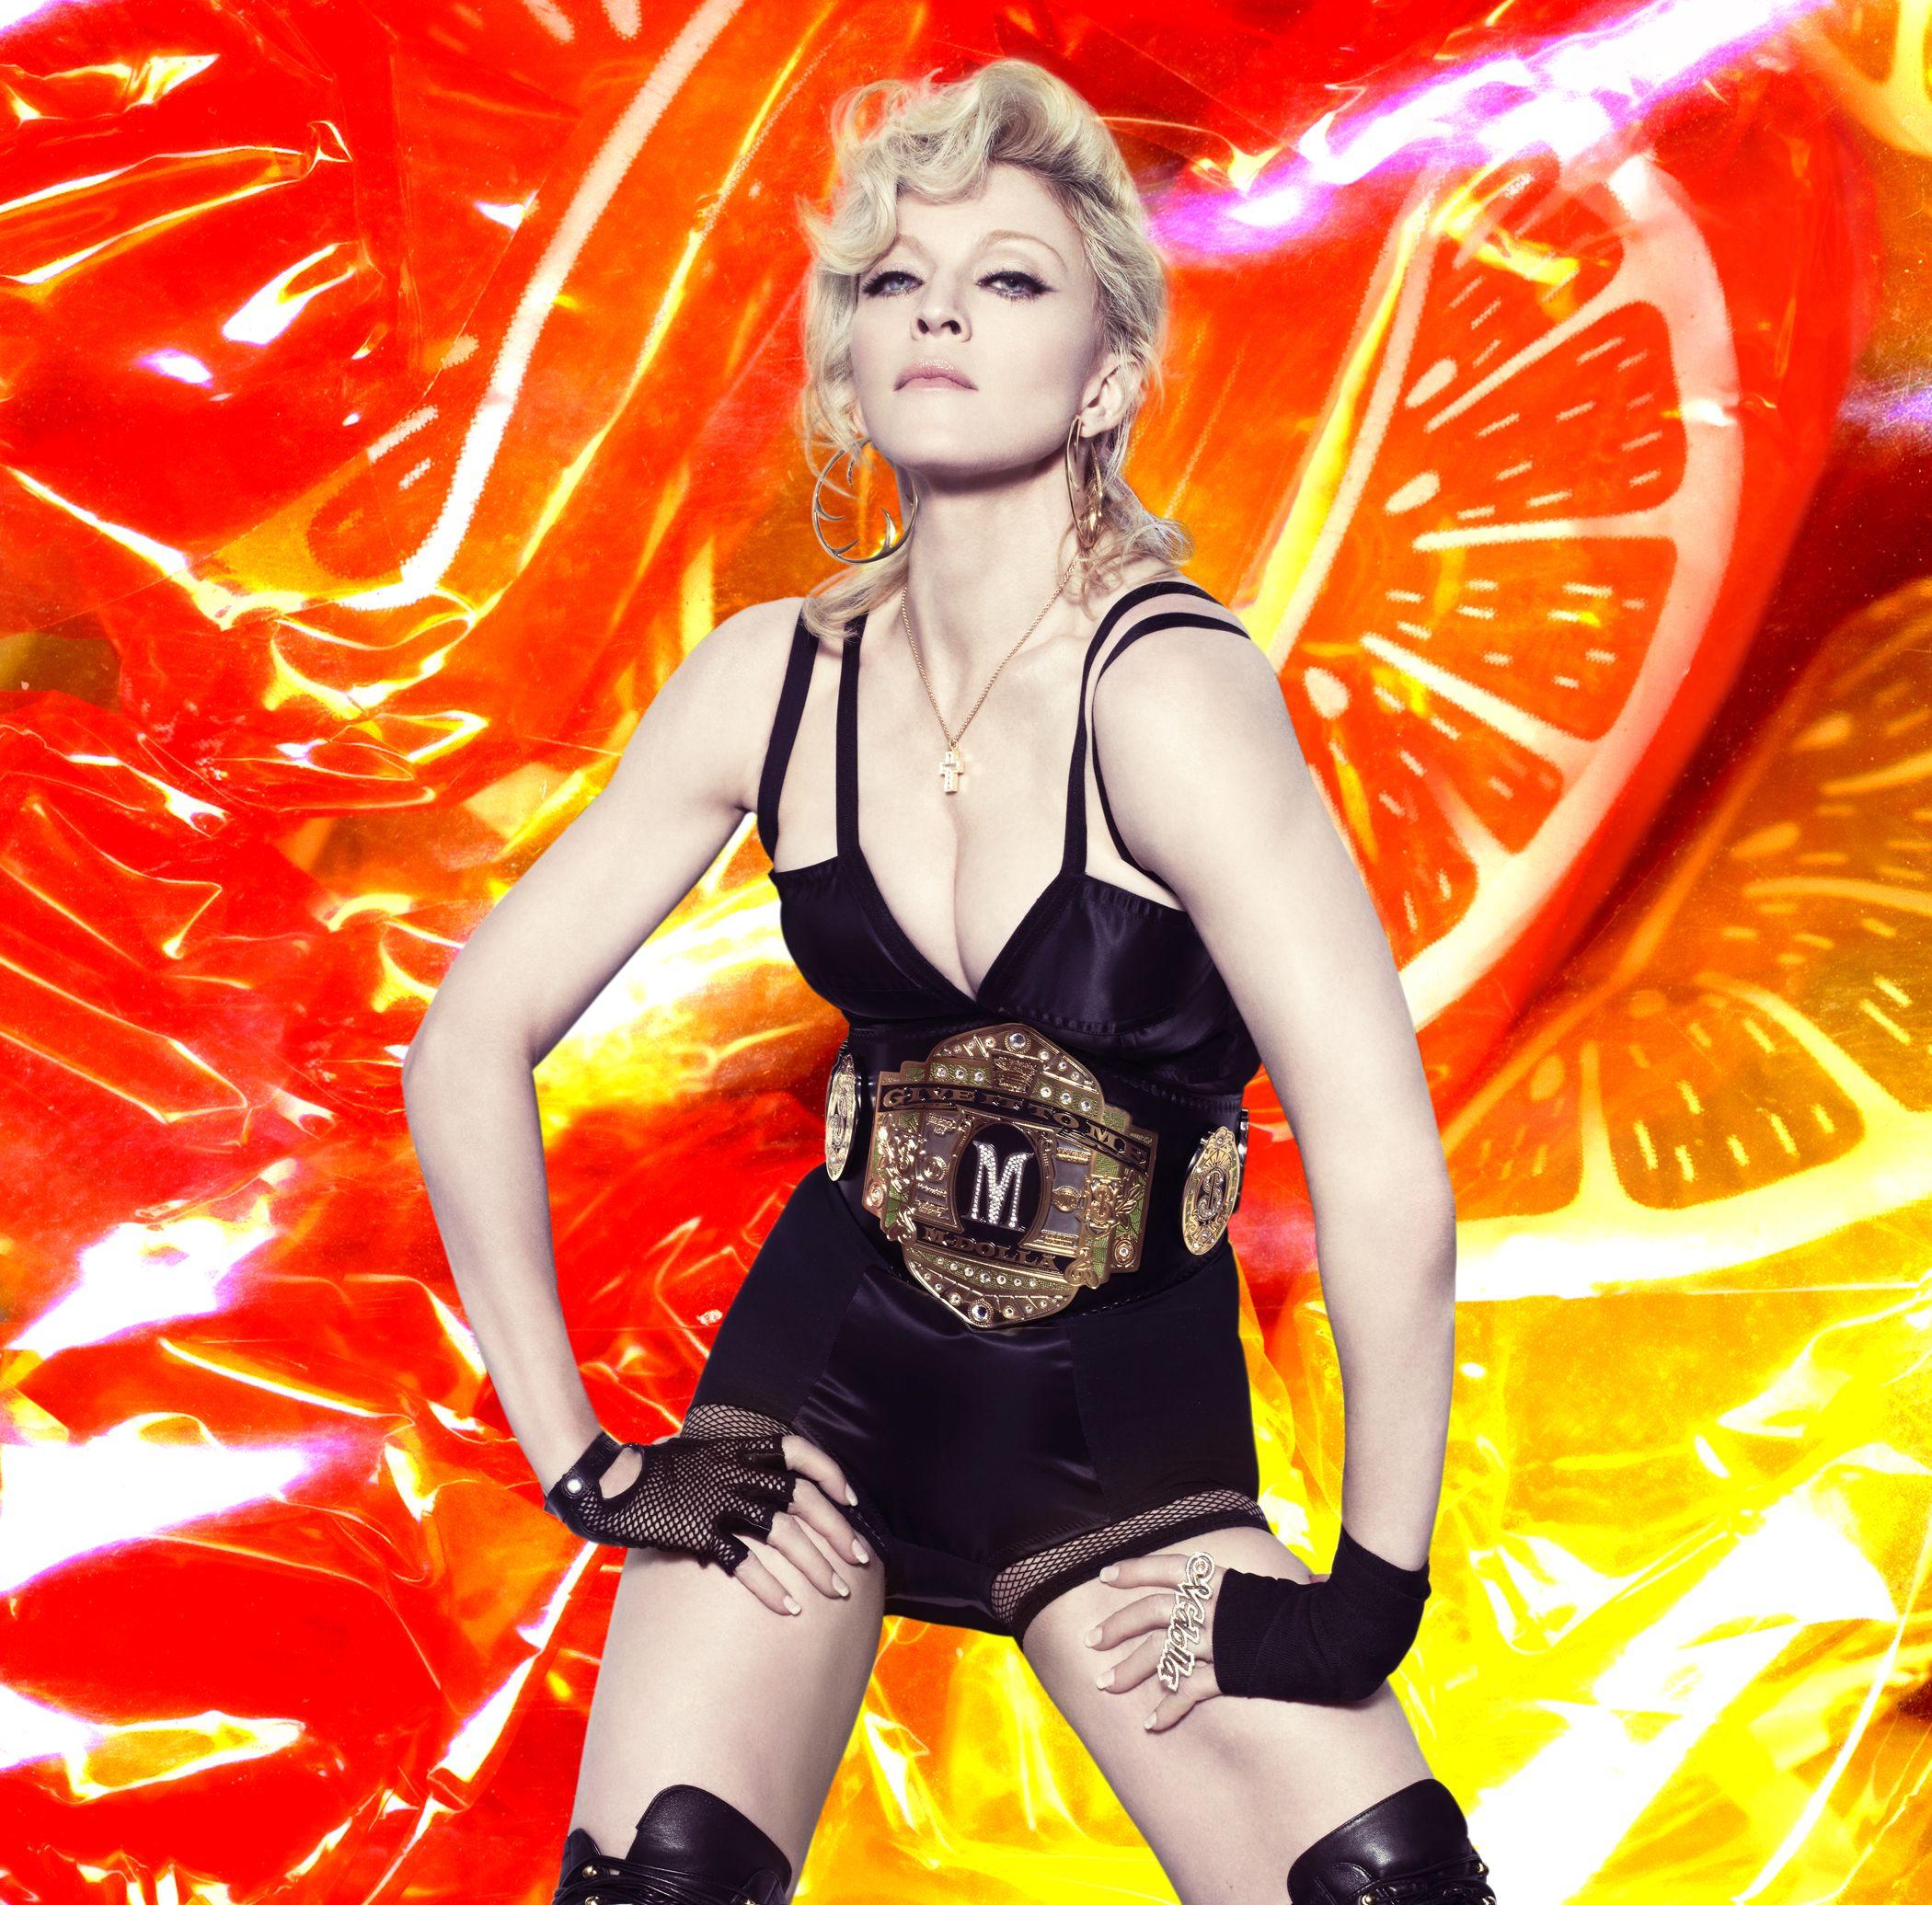 Madonna: Barbatii de varsta mea sunt grasi, chei si plictisitori!